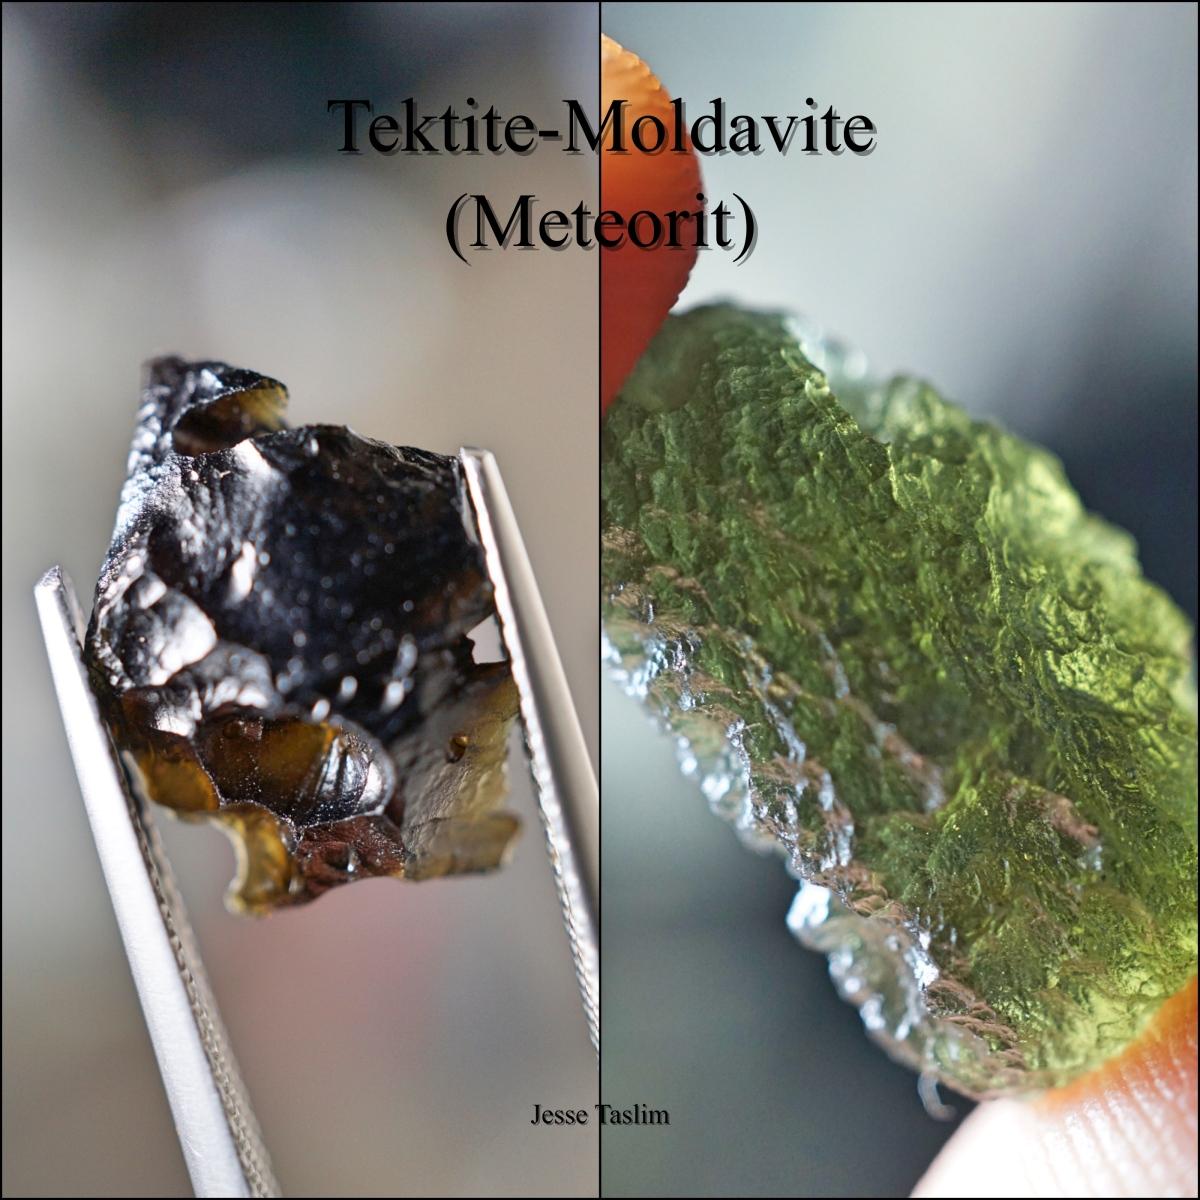 Tektite Moldavite (Meteorit)